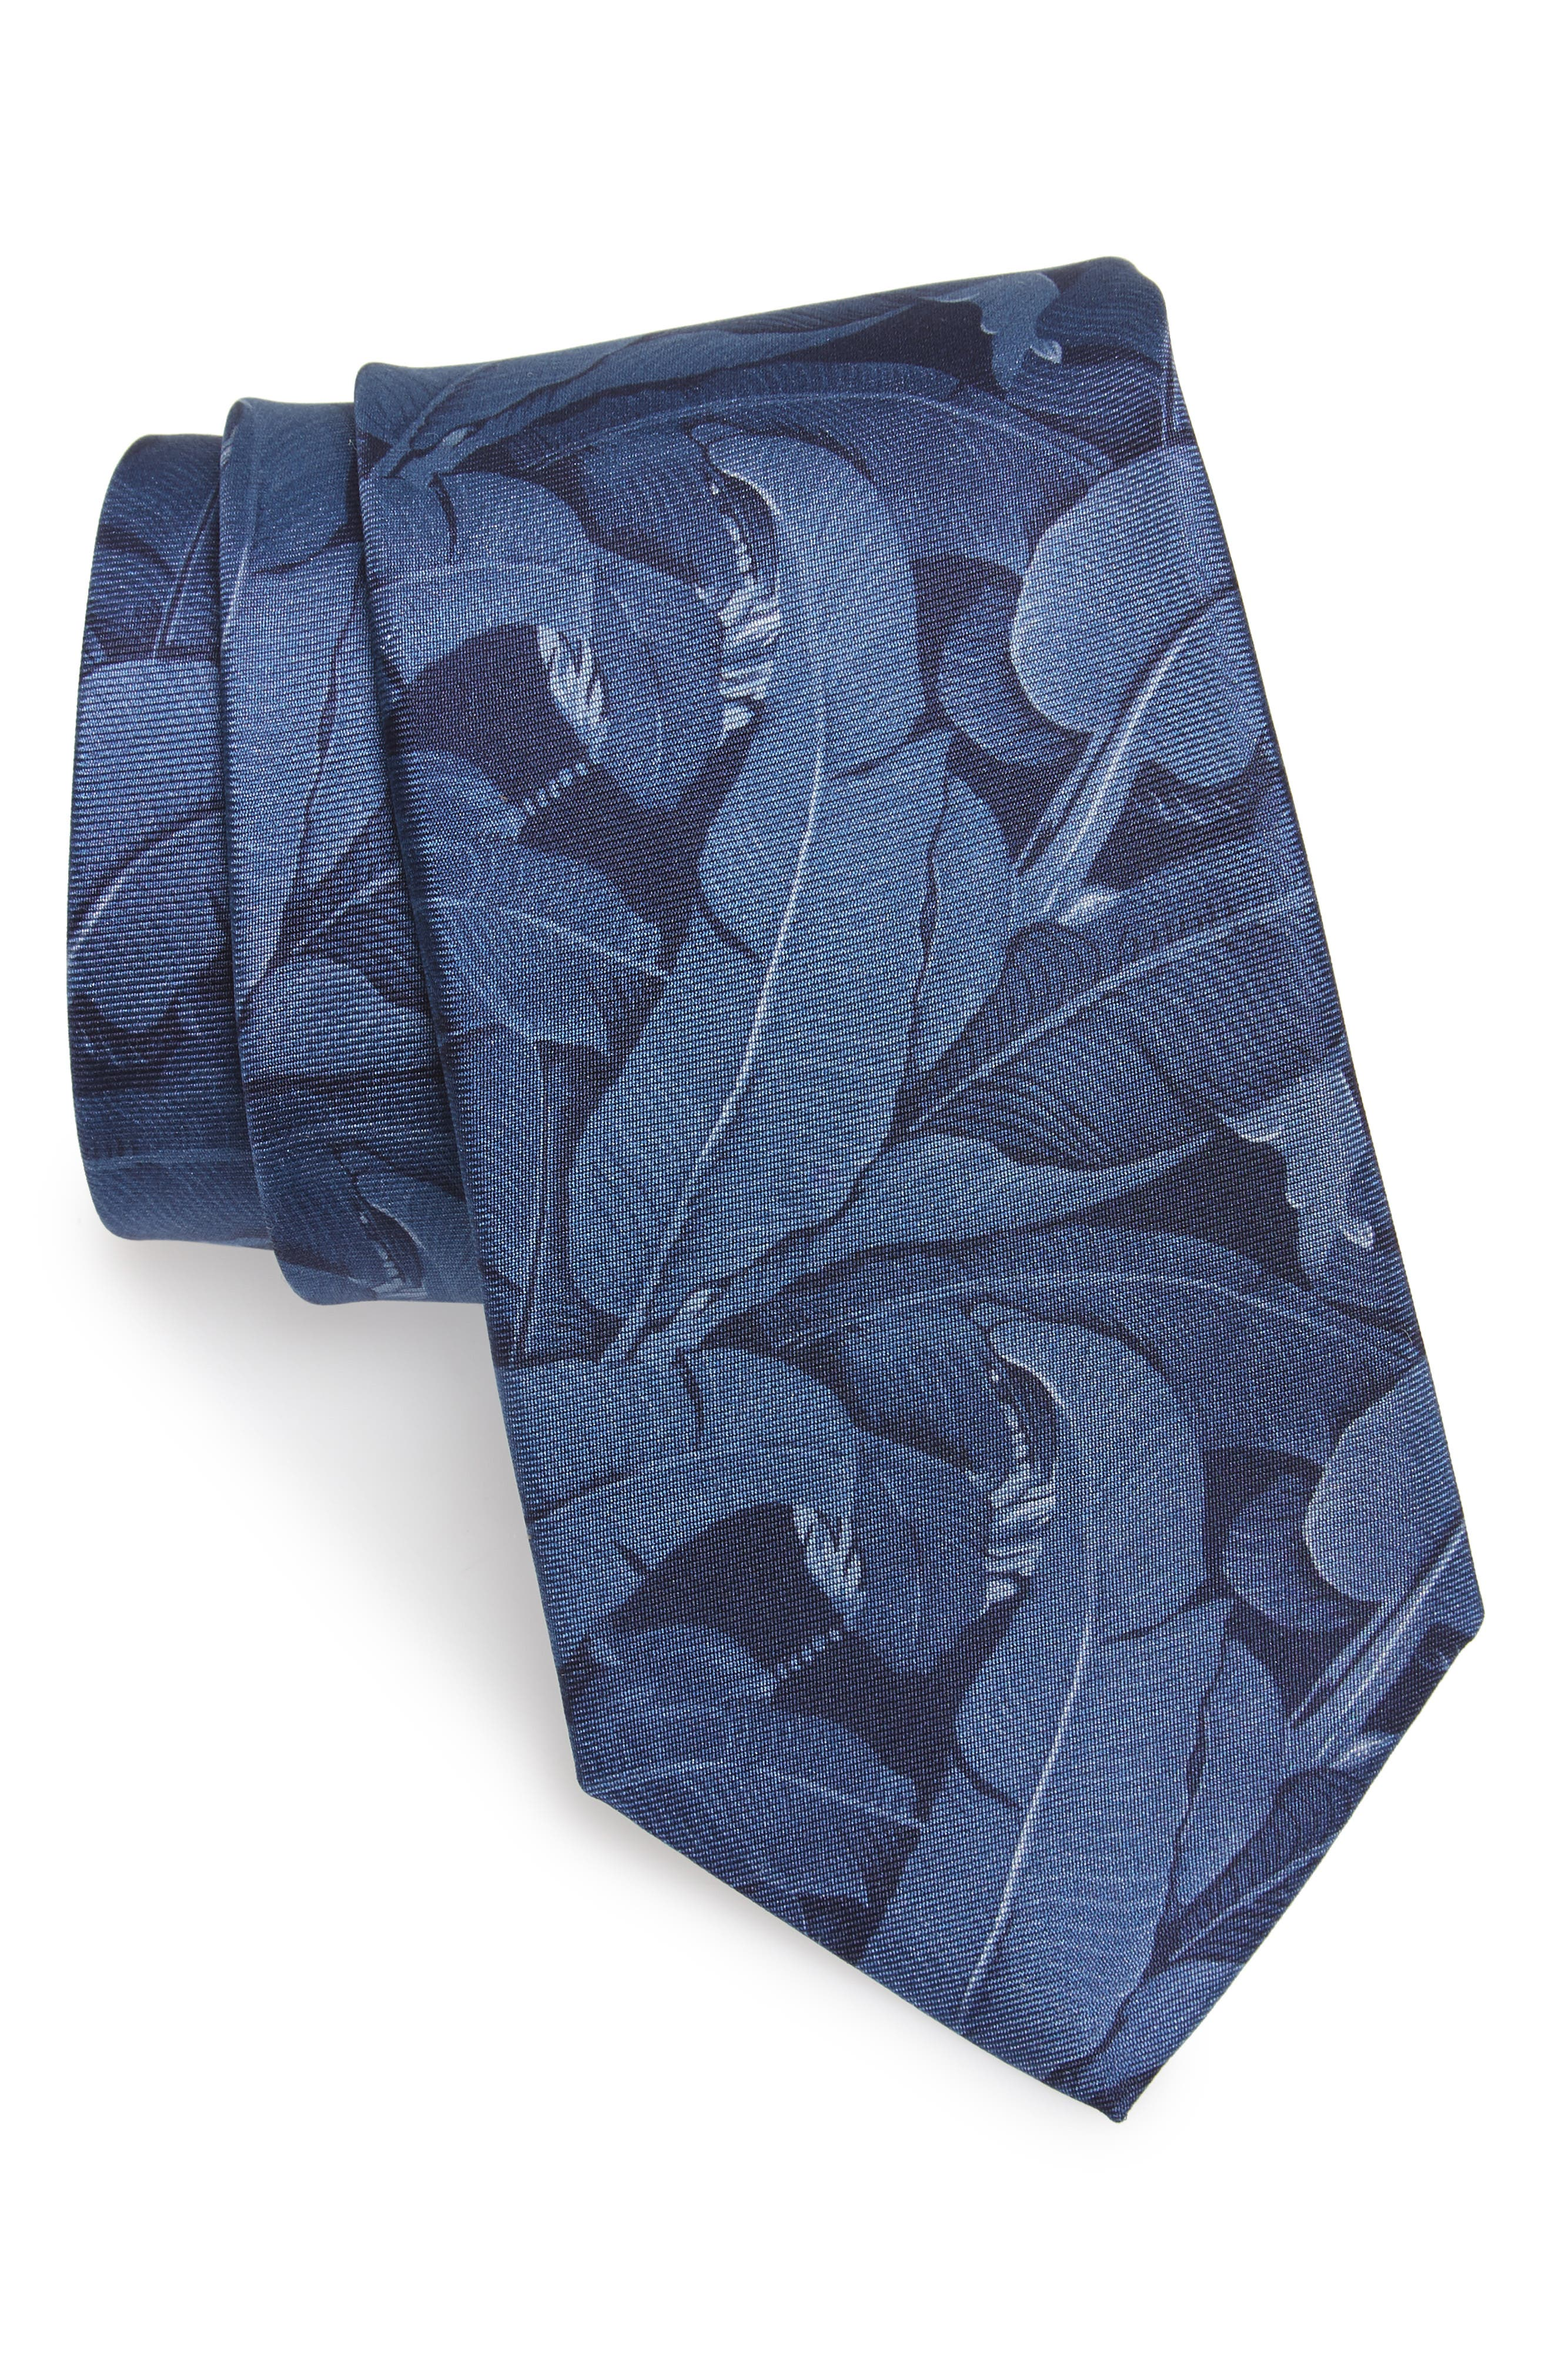 Banana Leaf Silk Tie,                         Main,                         color, Maritime Blue